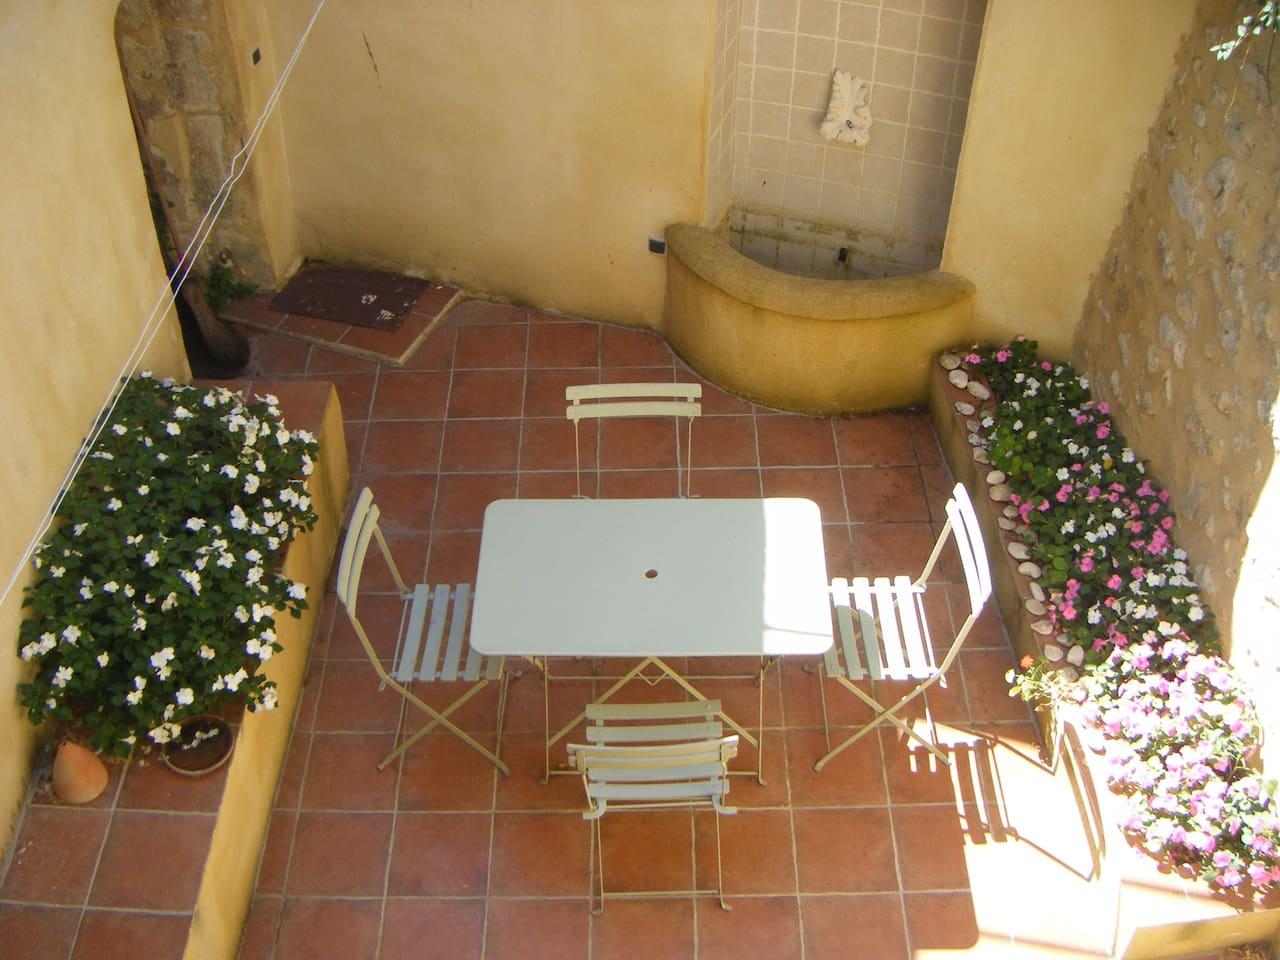 Sanilhac,Gard-Small village house